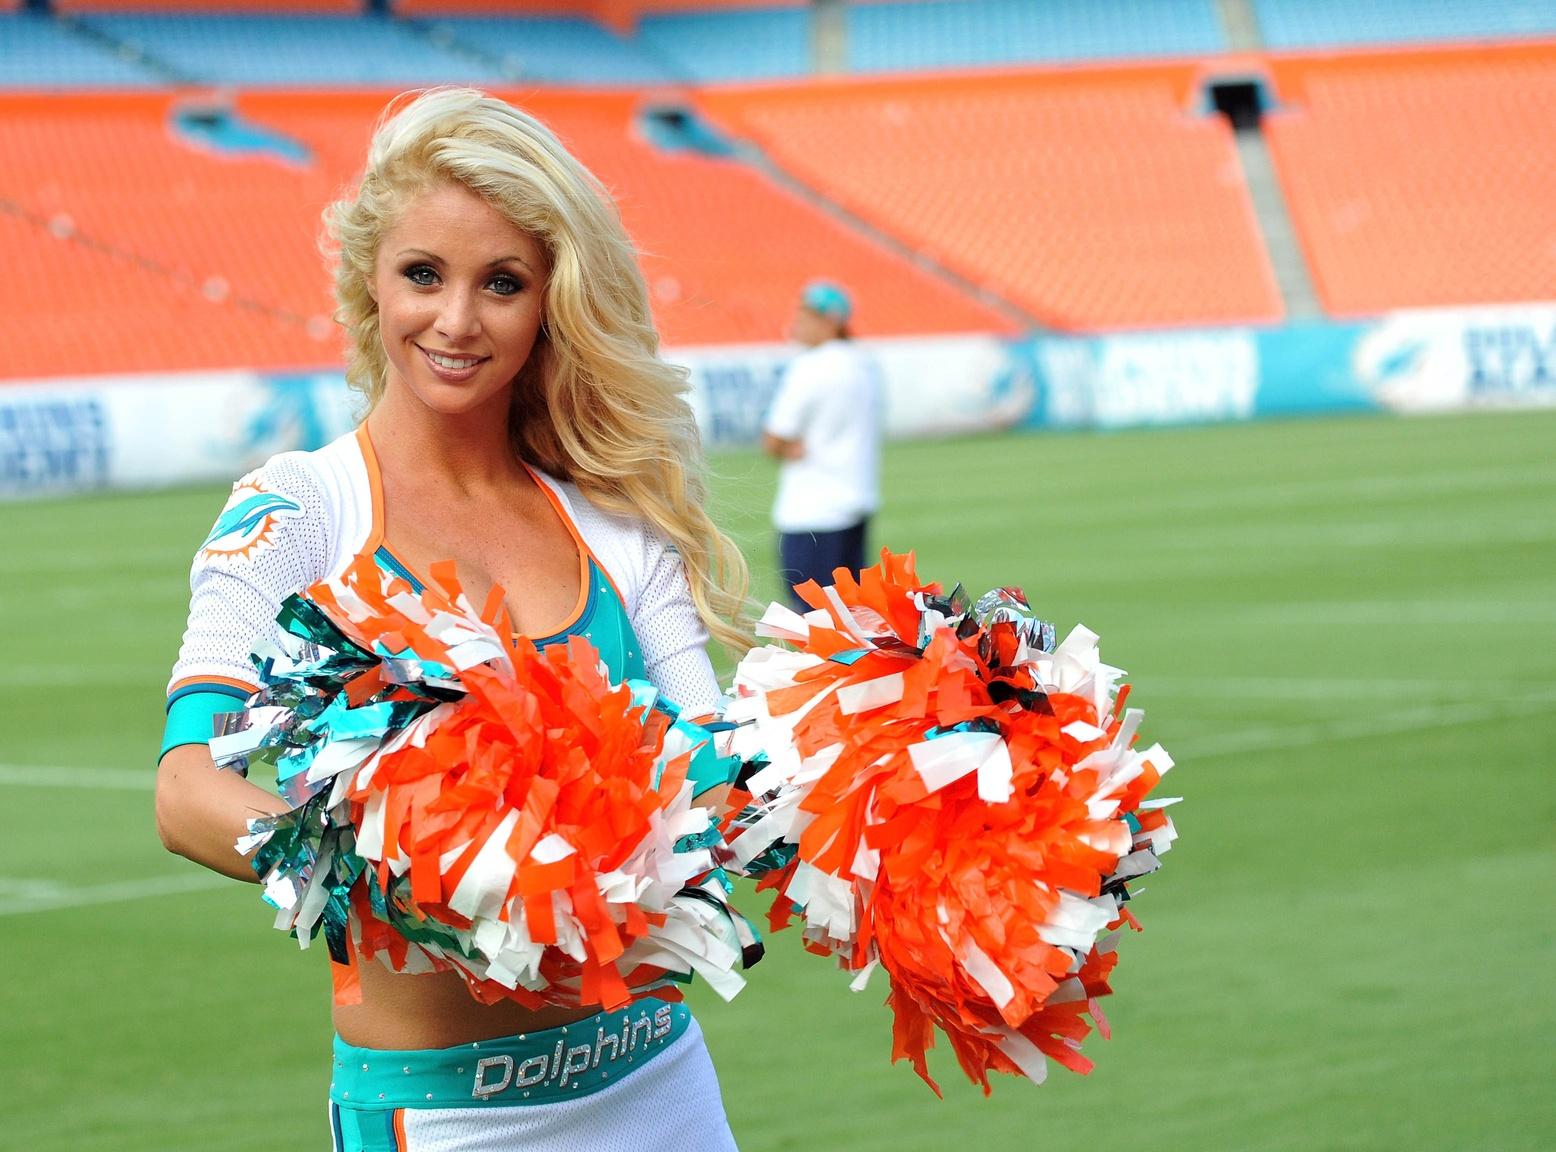 Between speaking, miami dolphins cheerleader lilly robbins hot properties